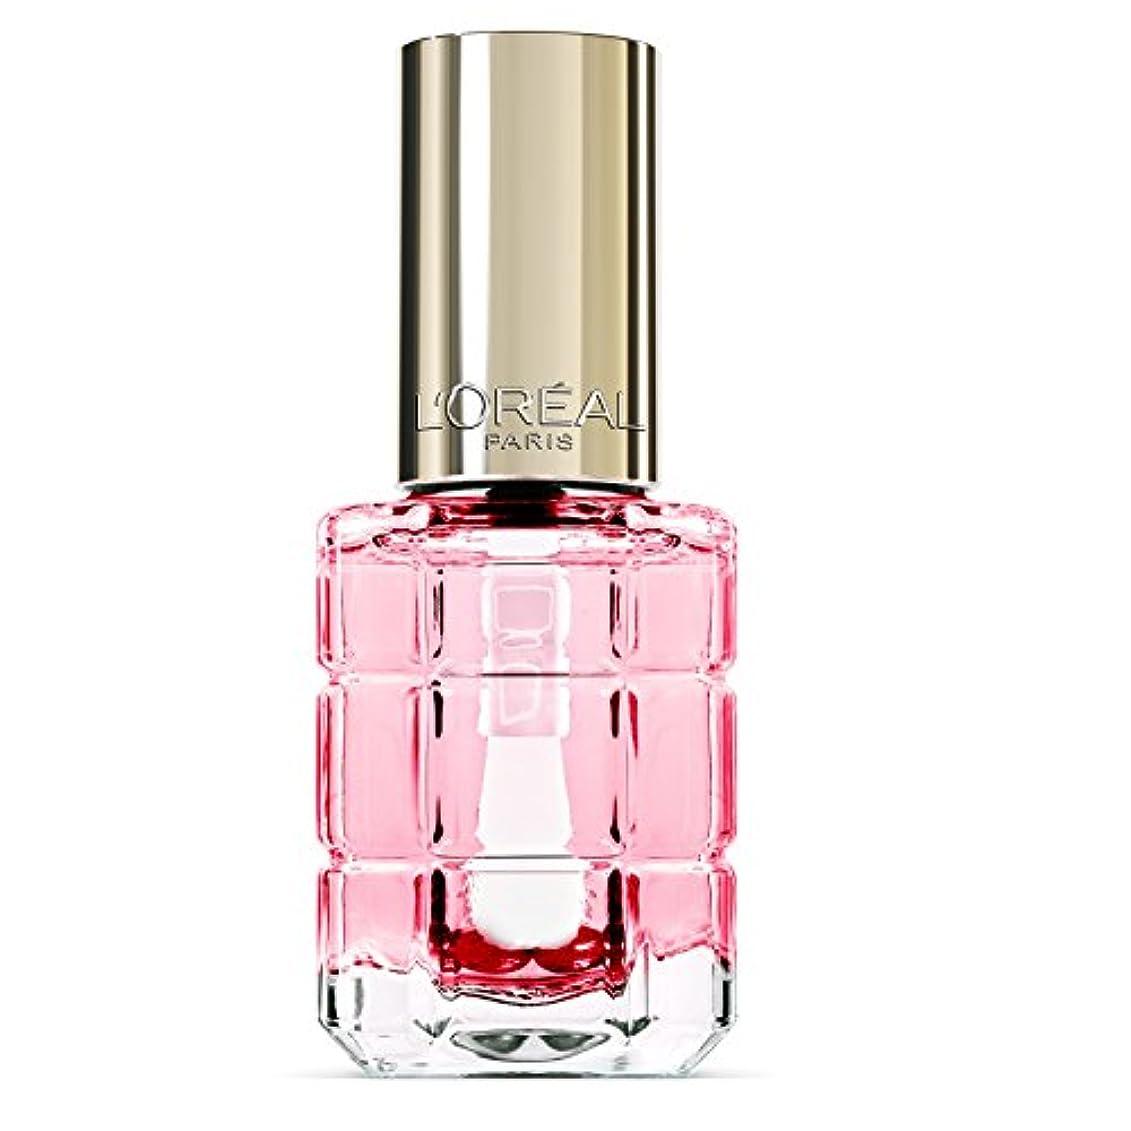 便益シーンロックL'Oréal Paris Make Up Designer Color Riche Maniküre Ölmalerei Grundlage von Nagellack Kamelie für Wachstum der...